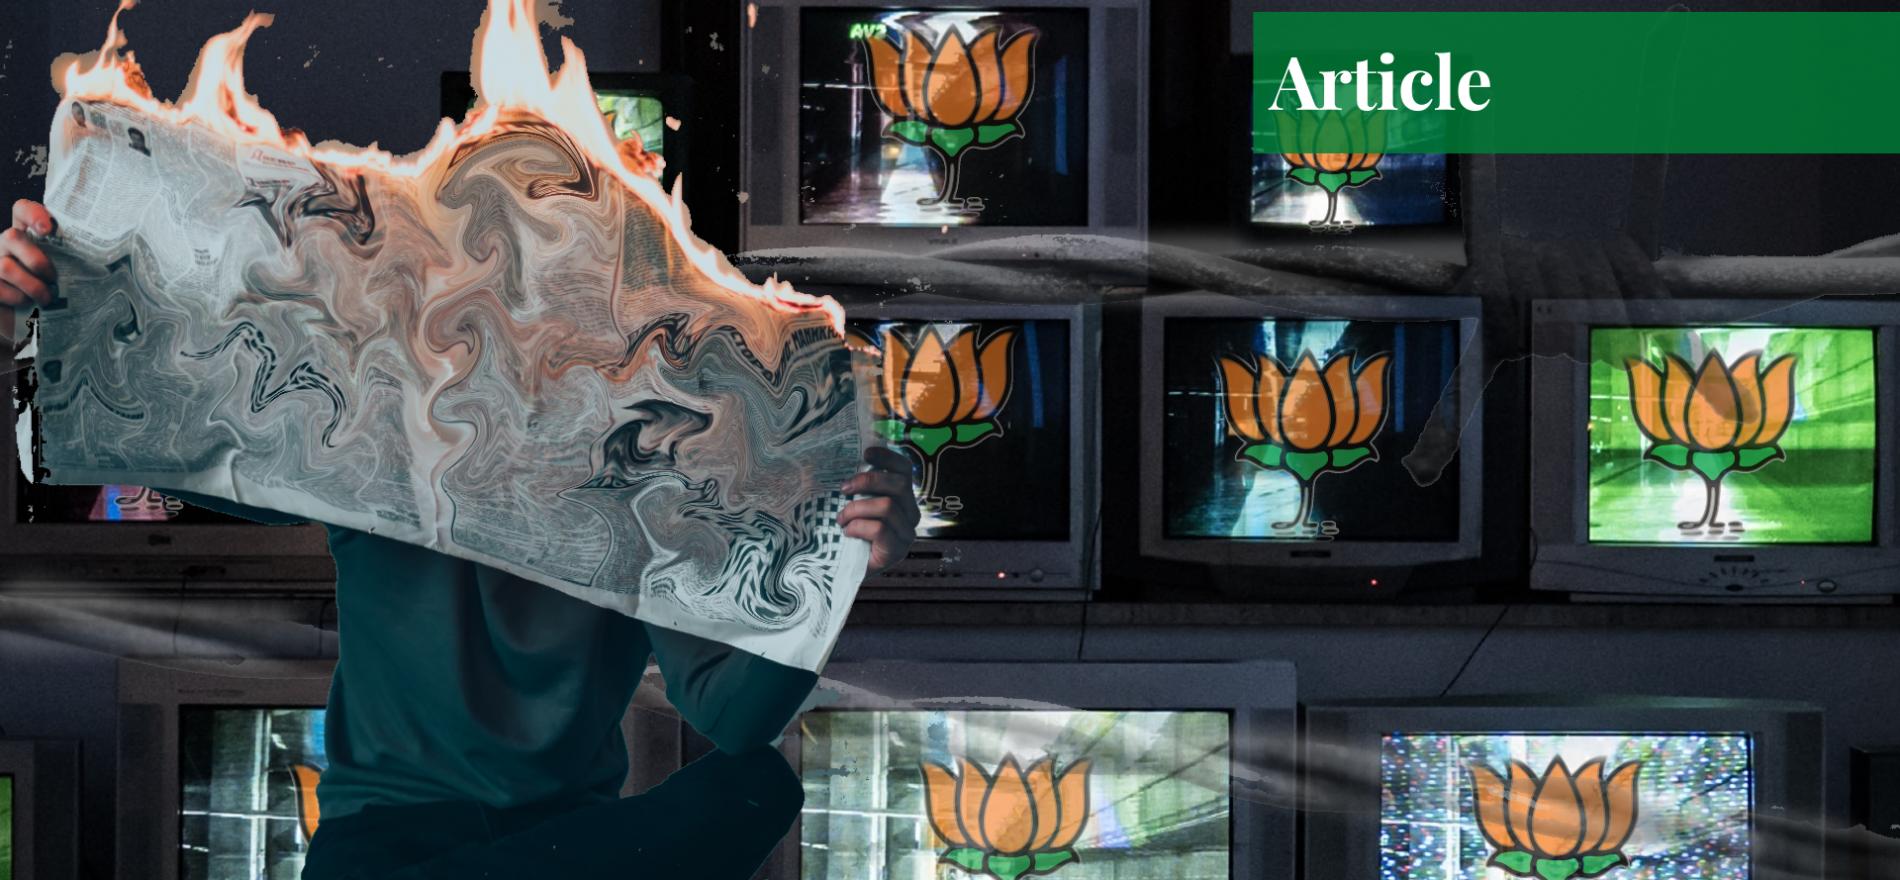 Indian media bjp